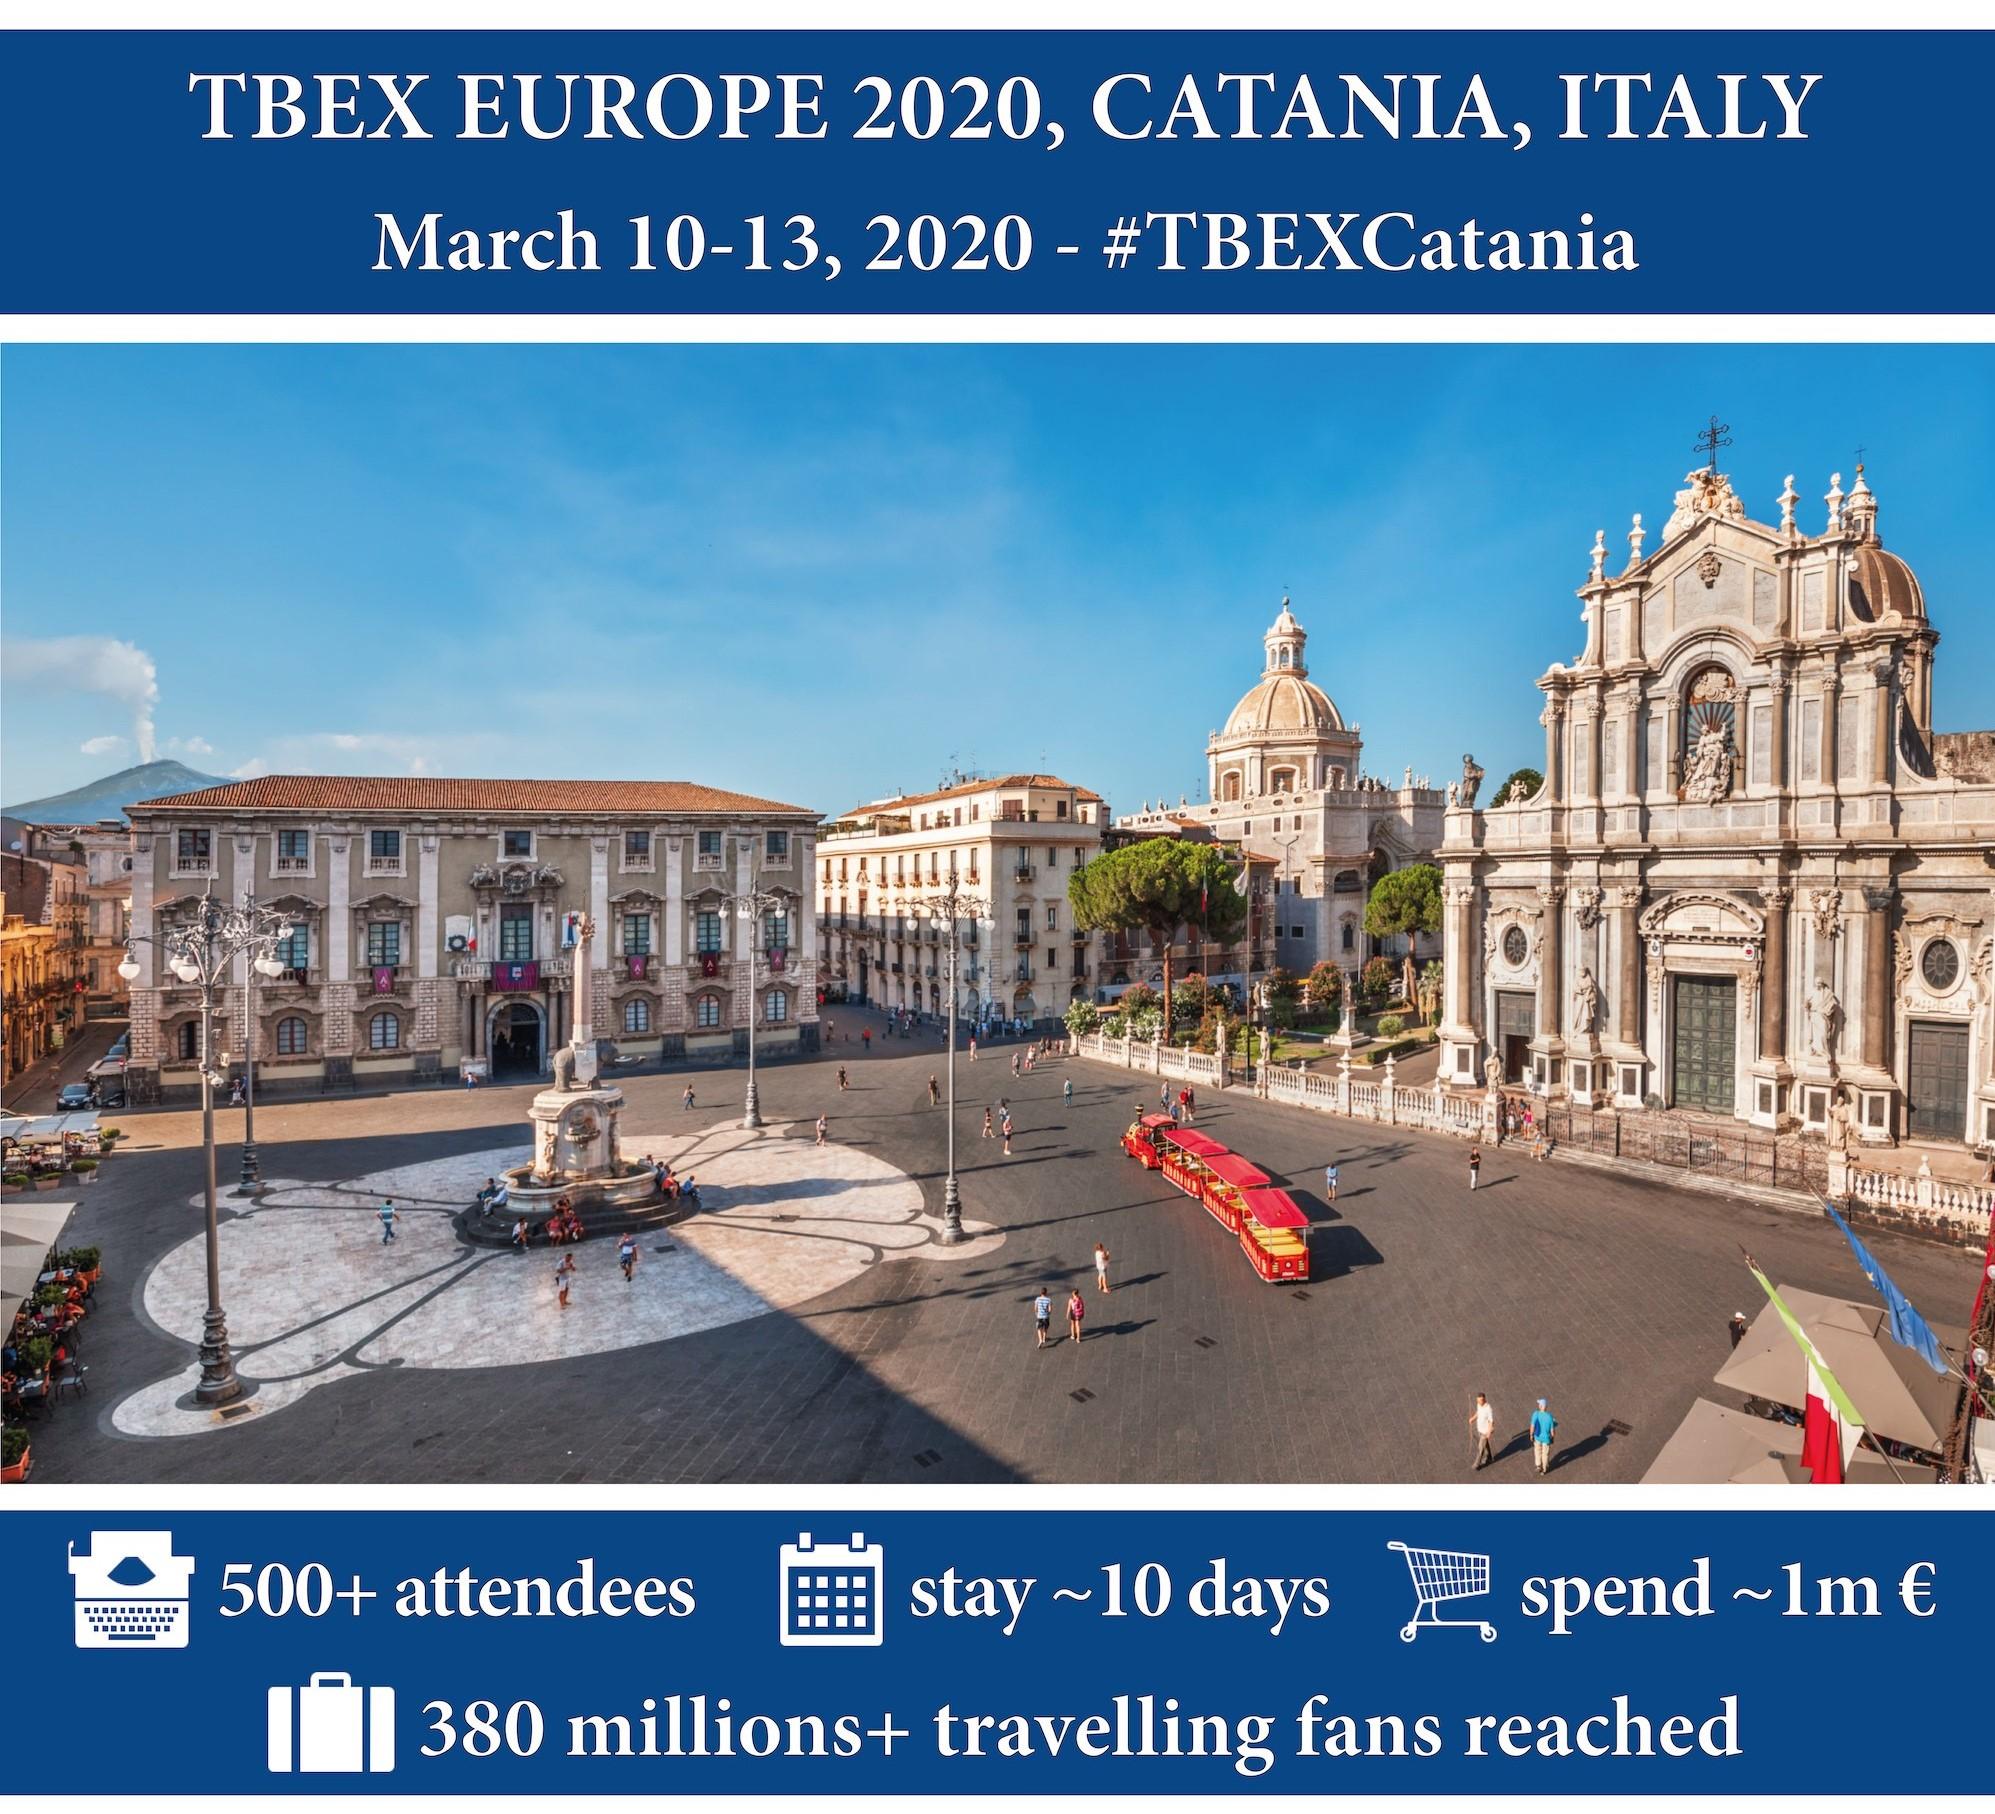 Campagna pubblicitaria TBEX Catania